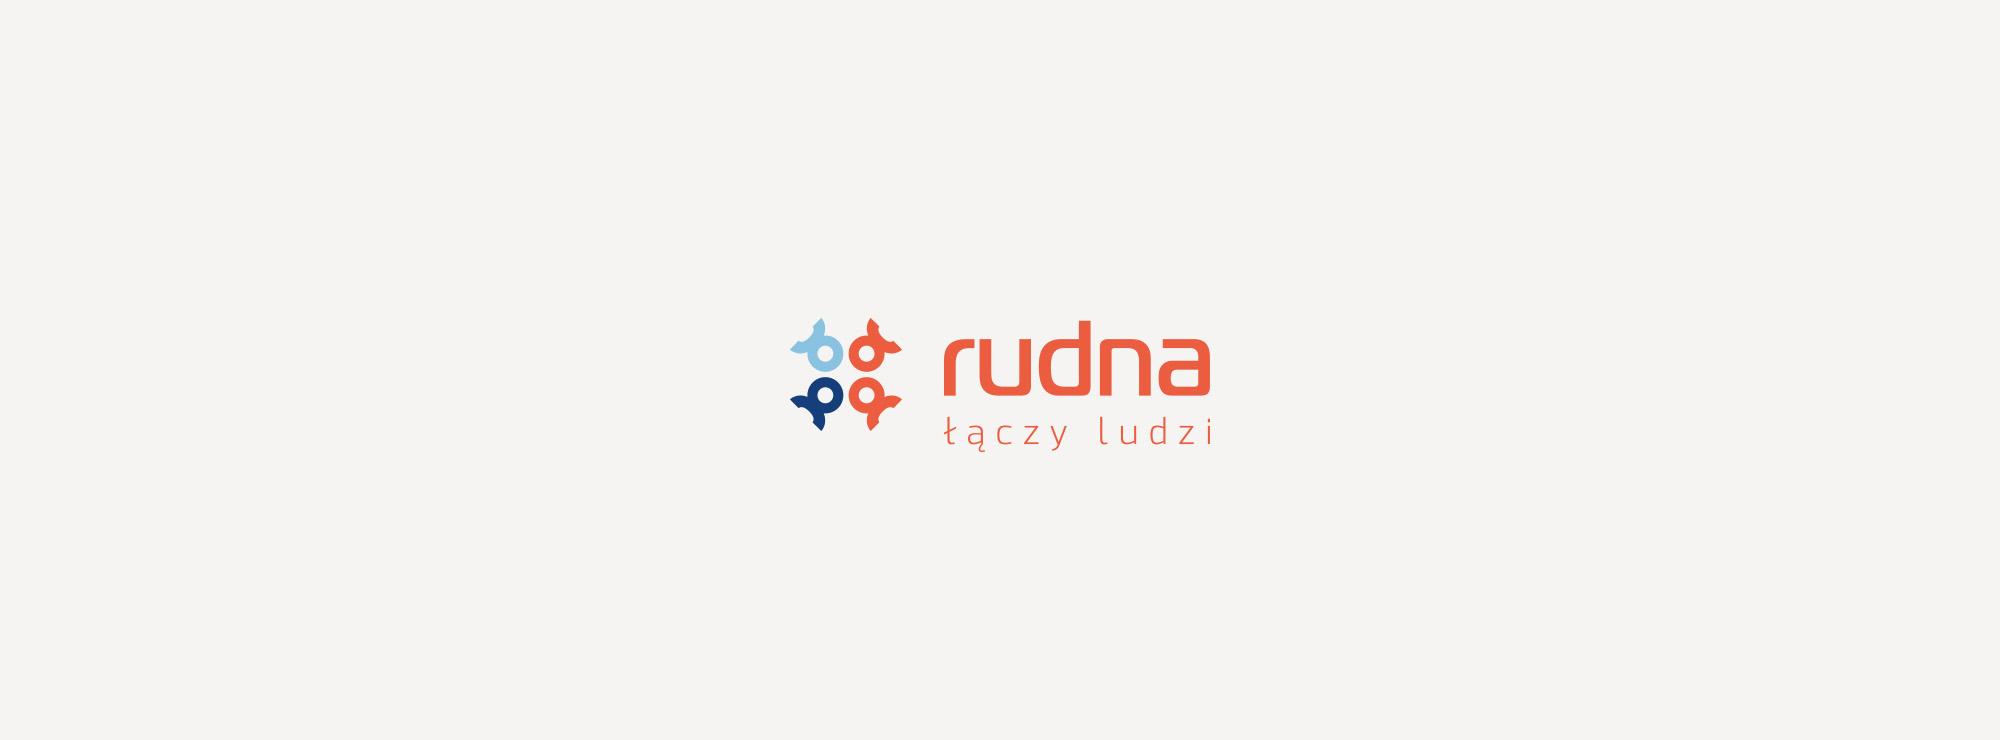 rudna logo basic.jpg